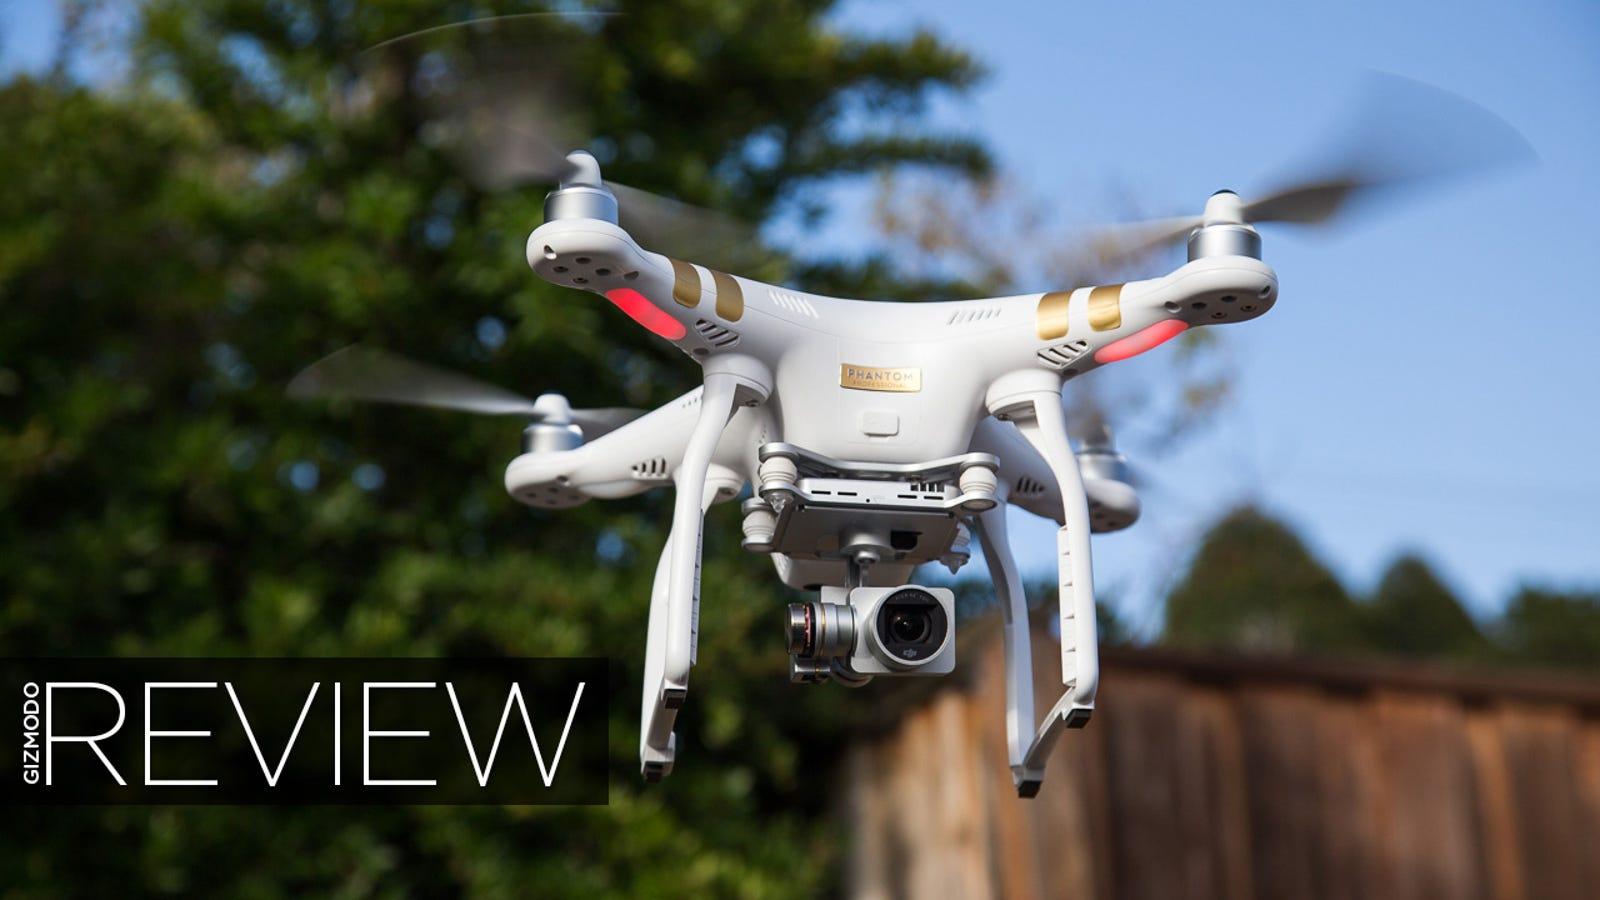 DJI Phantom 3 Review: Stunning Video + Easier Controls = Hell Yes